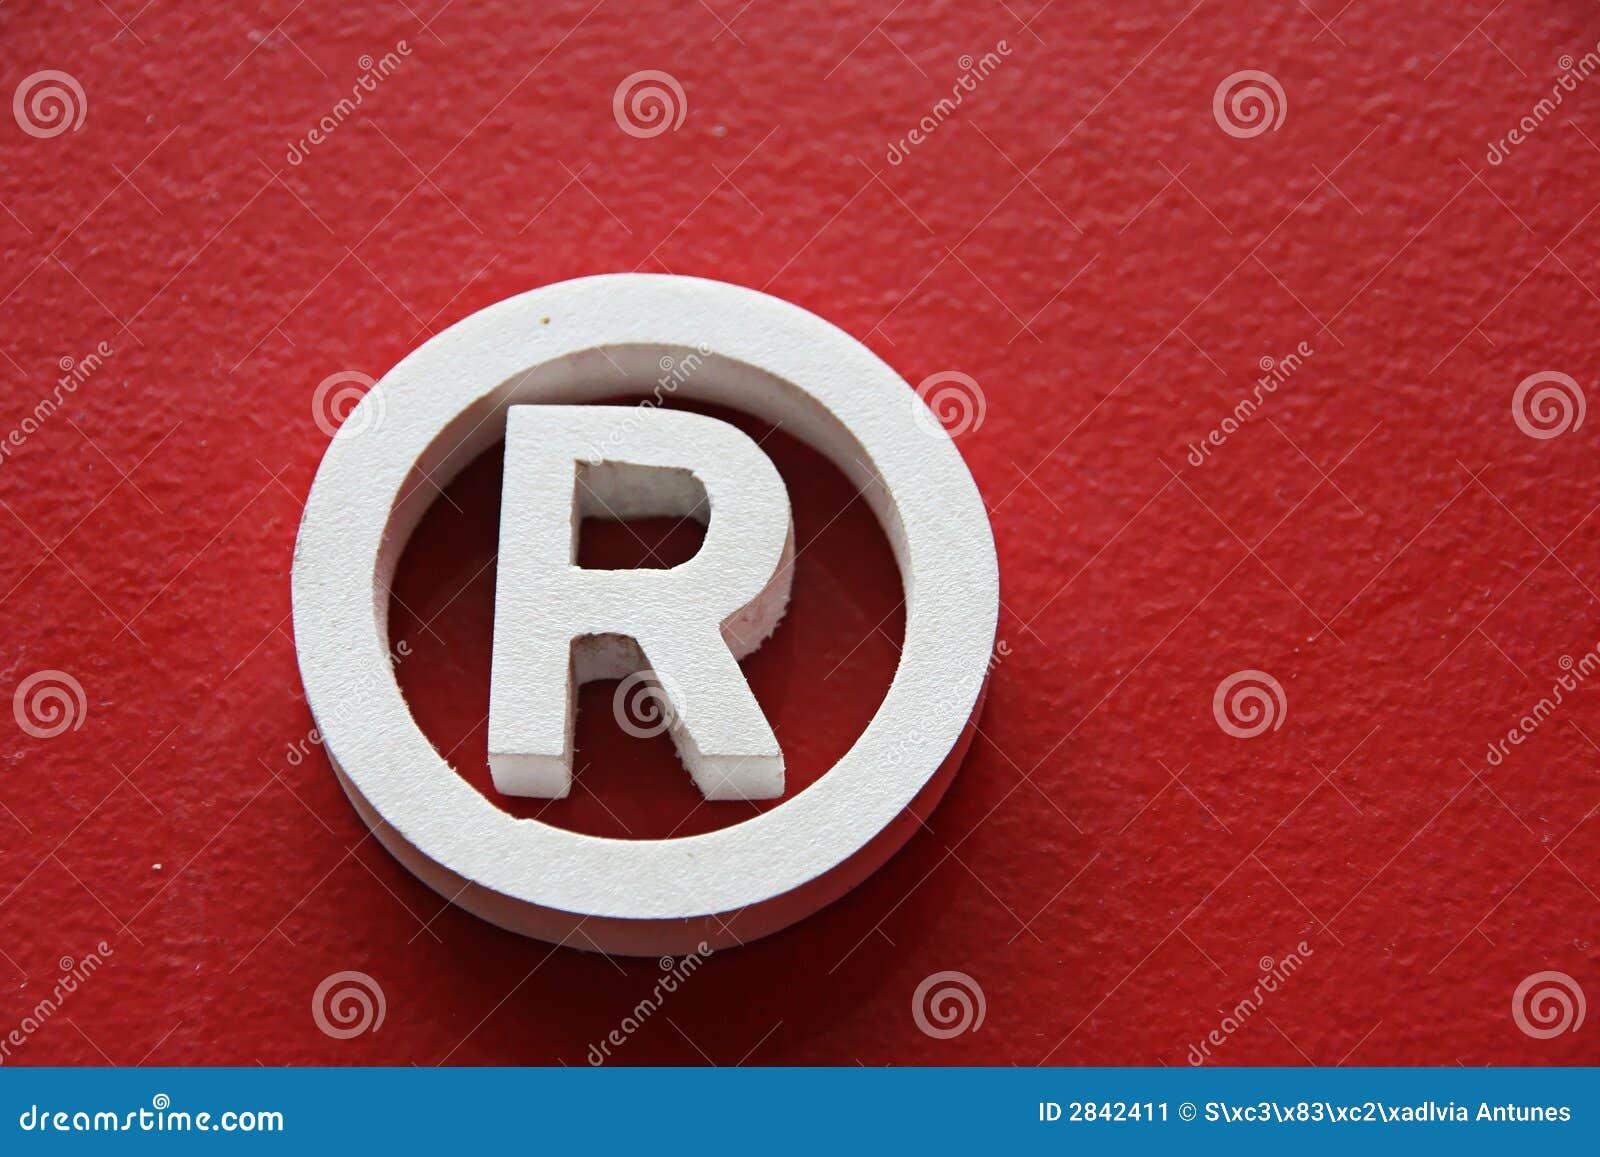 Register trademark symbol fieldstation buycottarizona